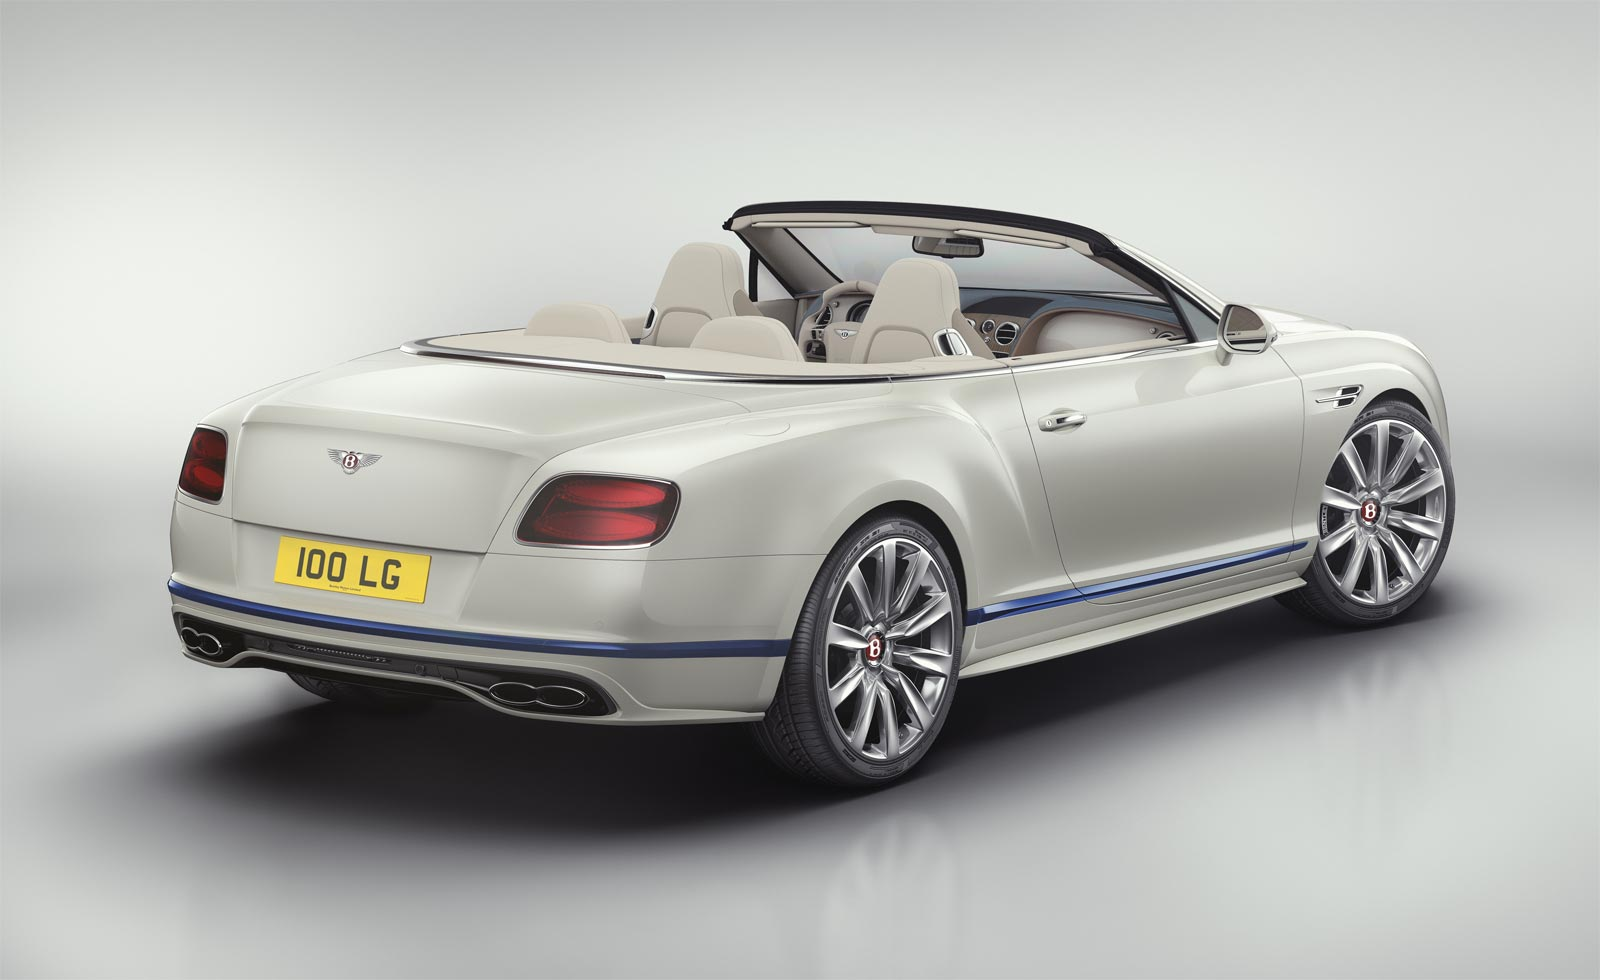 Bentley Motors and Princess Yachts Continental GT Convertible Galene Edition 9